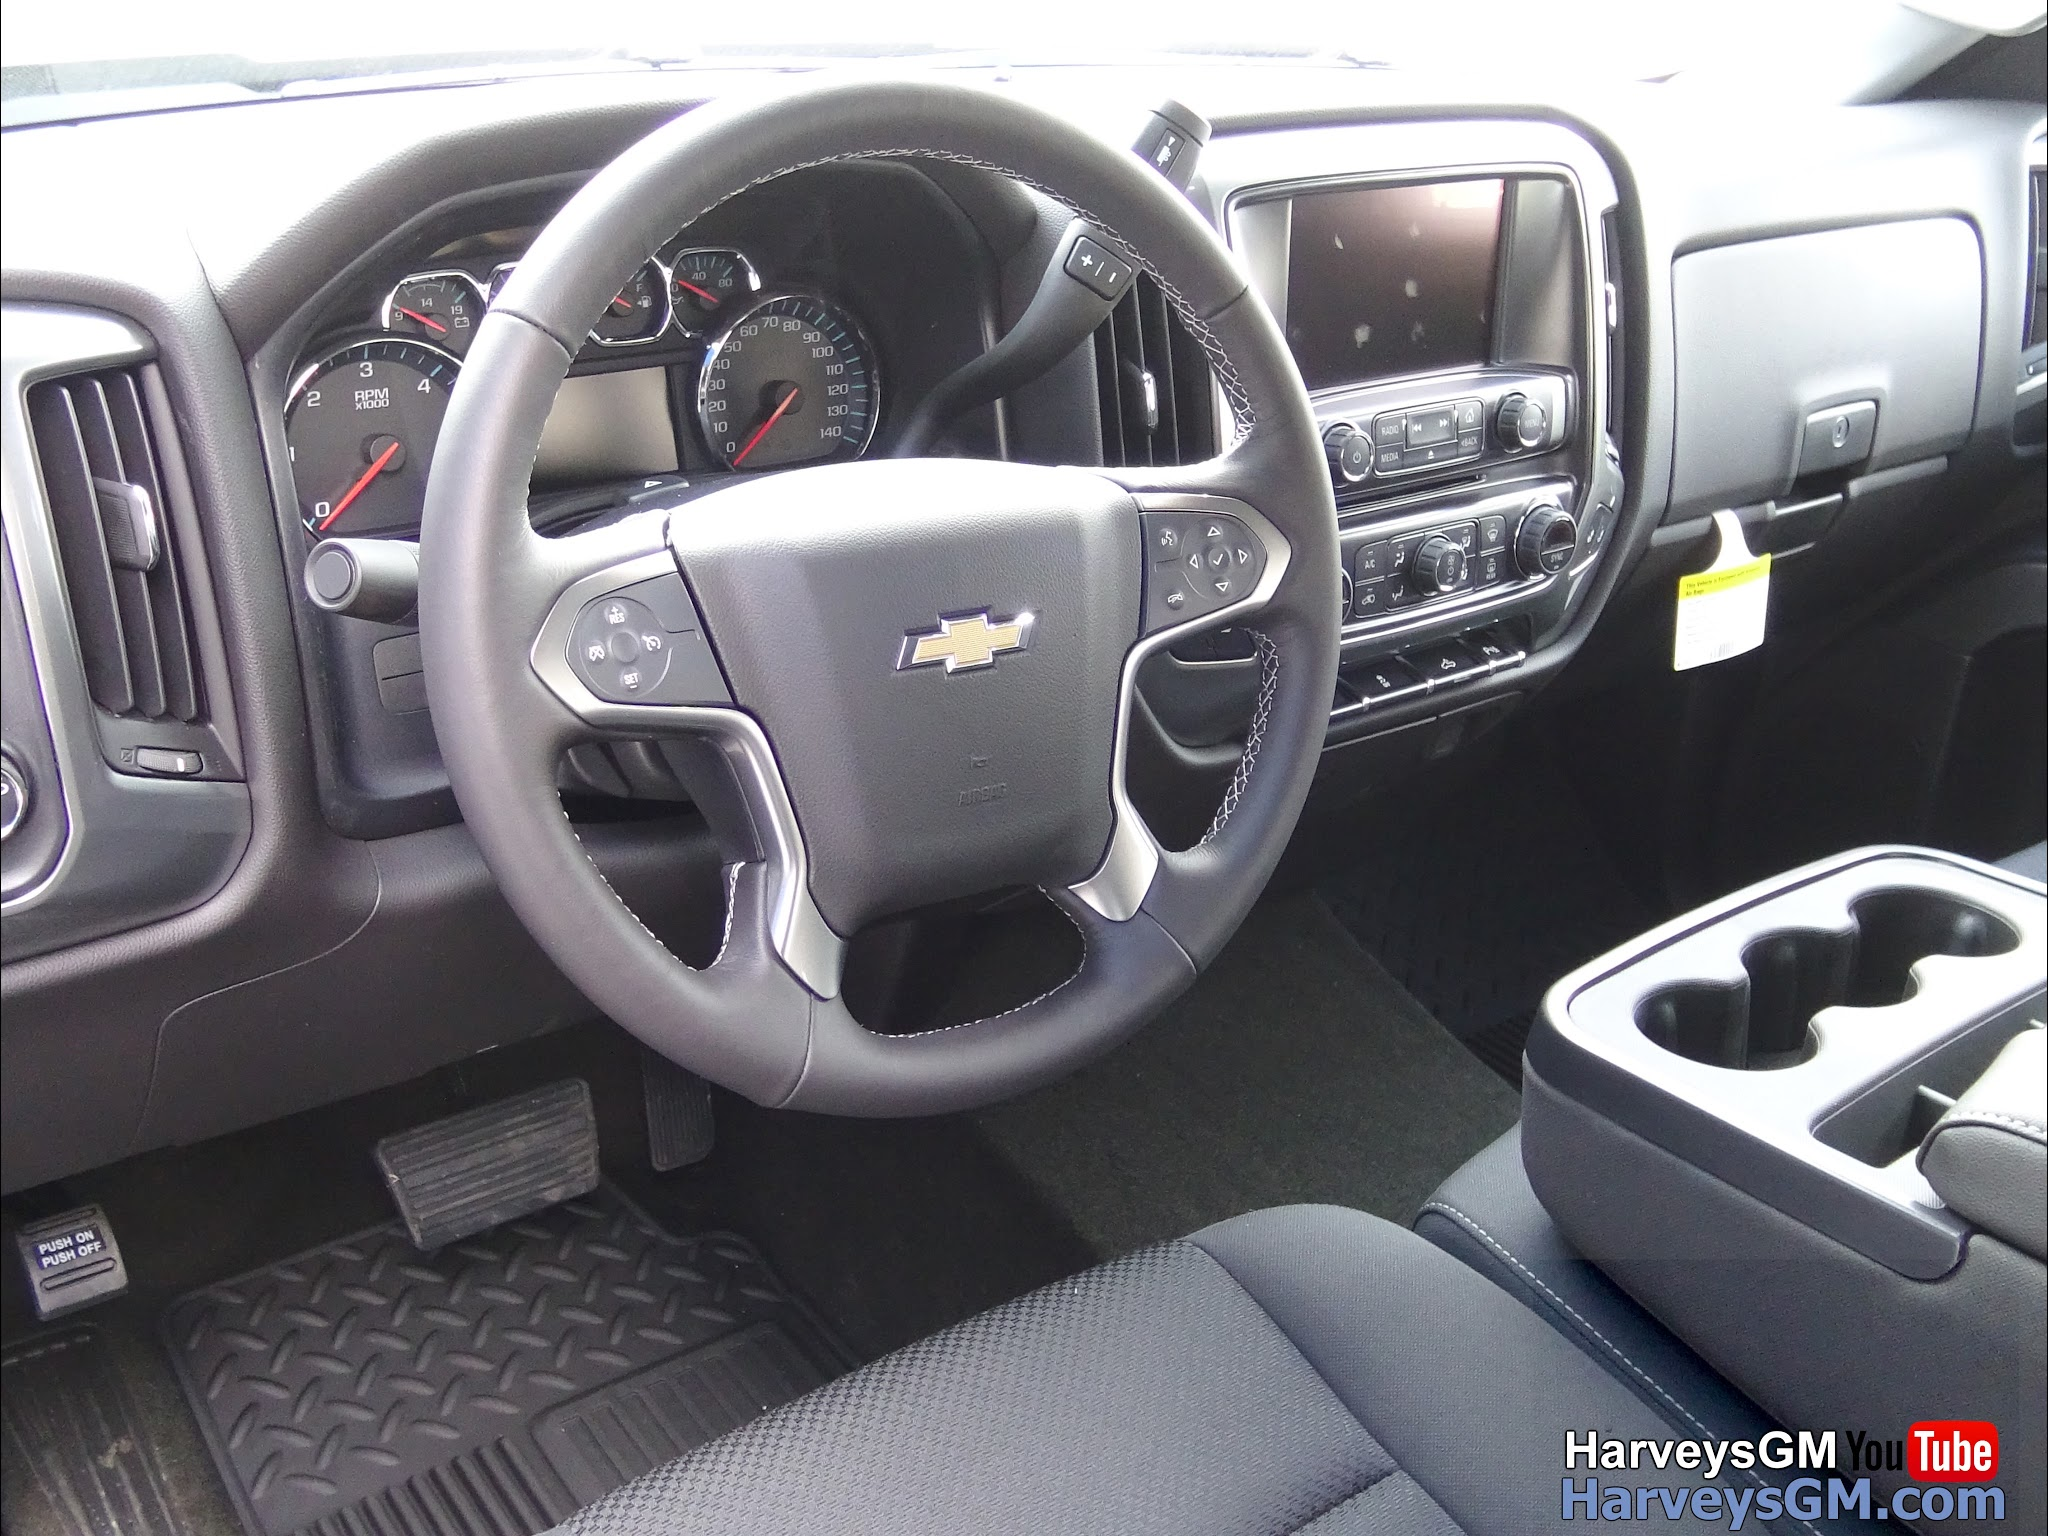 2016 Chevy Silverado 1500 Double Cab Standard Box 4wd Lt With 1lt Trailer Brake Wiring Chevrolet